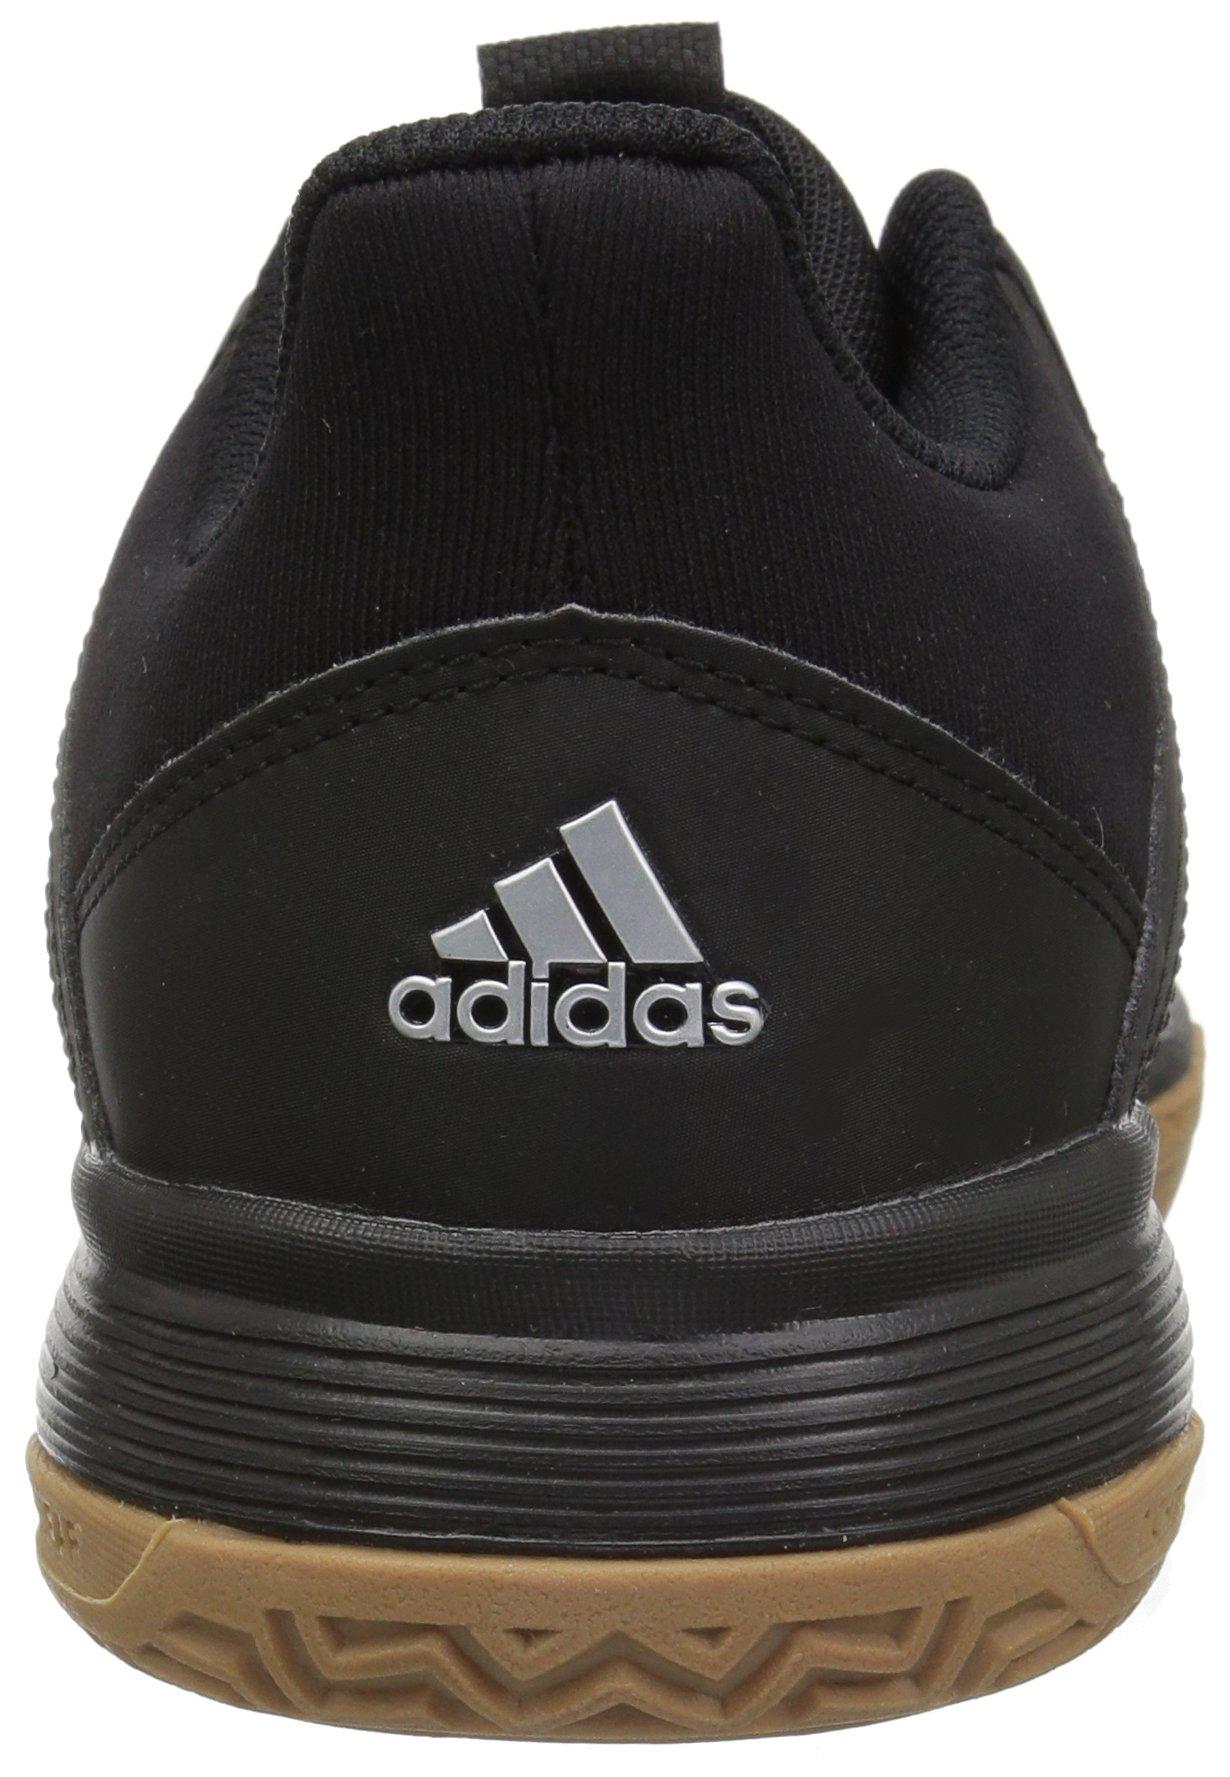 adidas Women's Ligra 6 Volleyball Shoe, Black/Silver Metallic/White, 7 M US by adidas (Image #2)